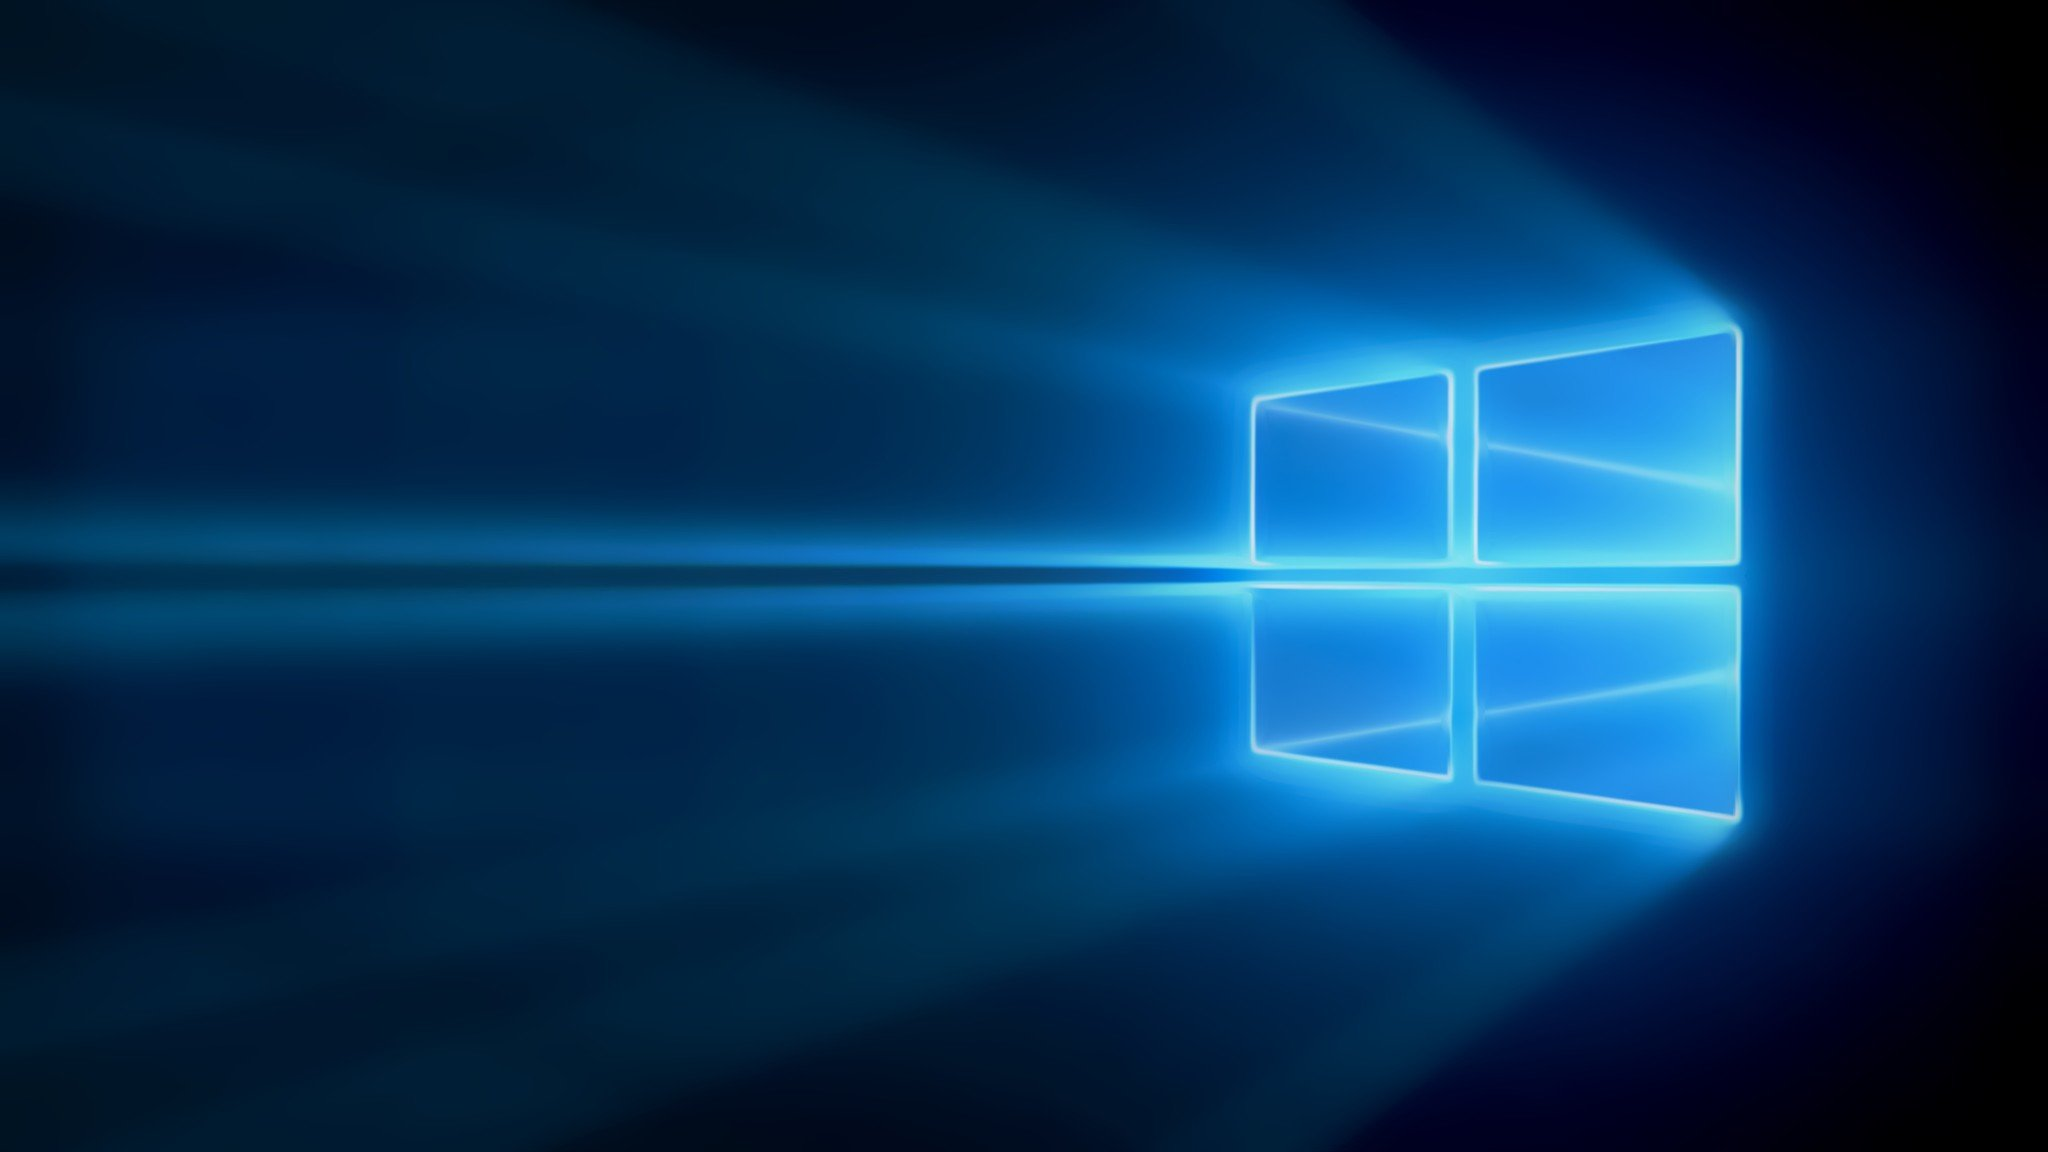 How to use Google Calendar on Windows 10 PC Windows Central